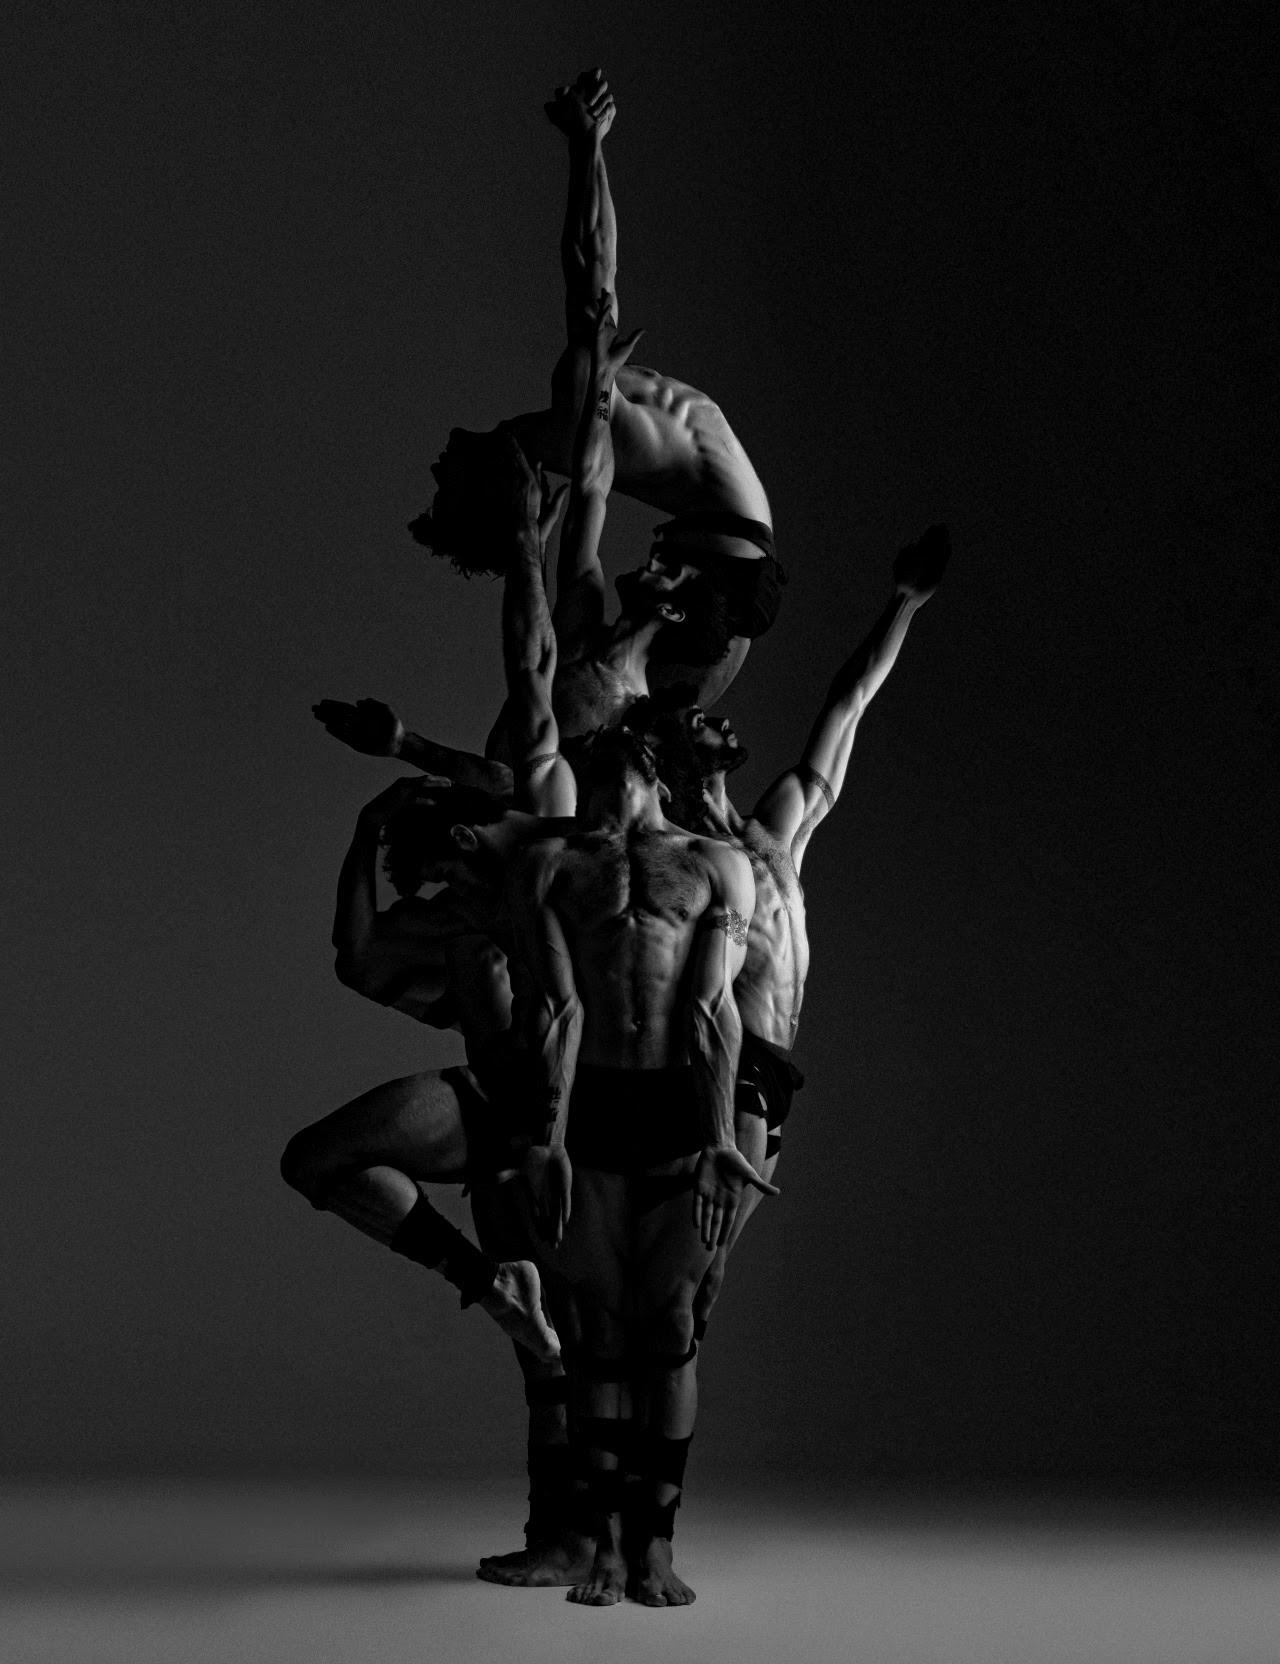 MonumentO, by Joan Crisol